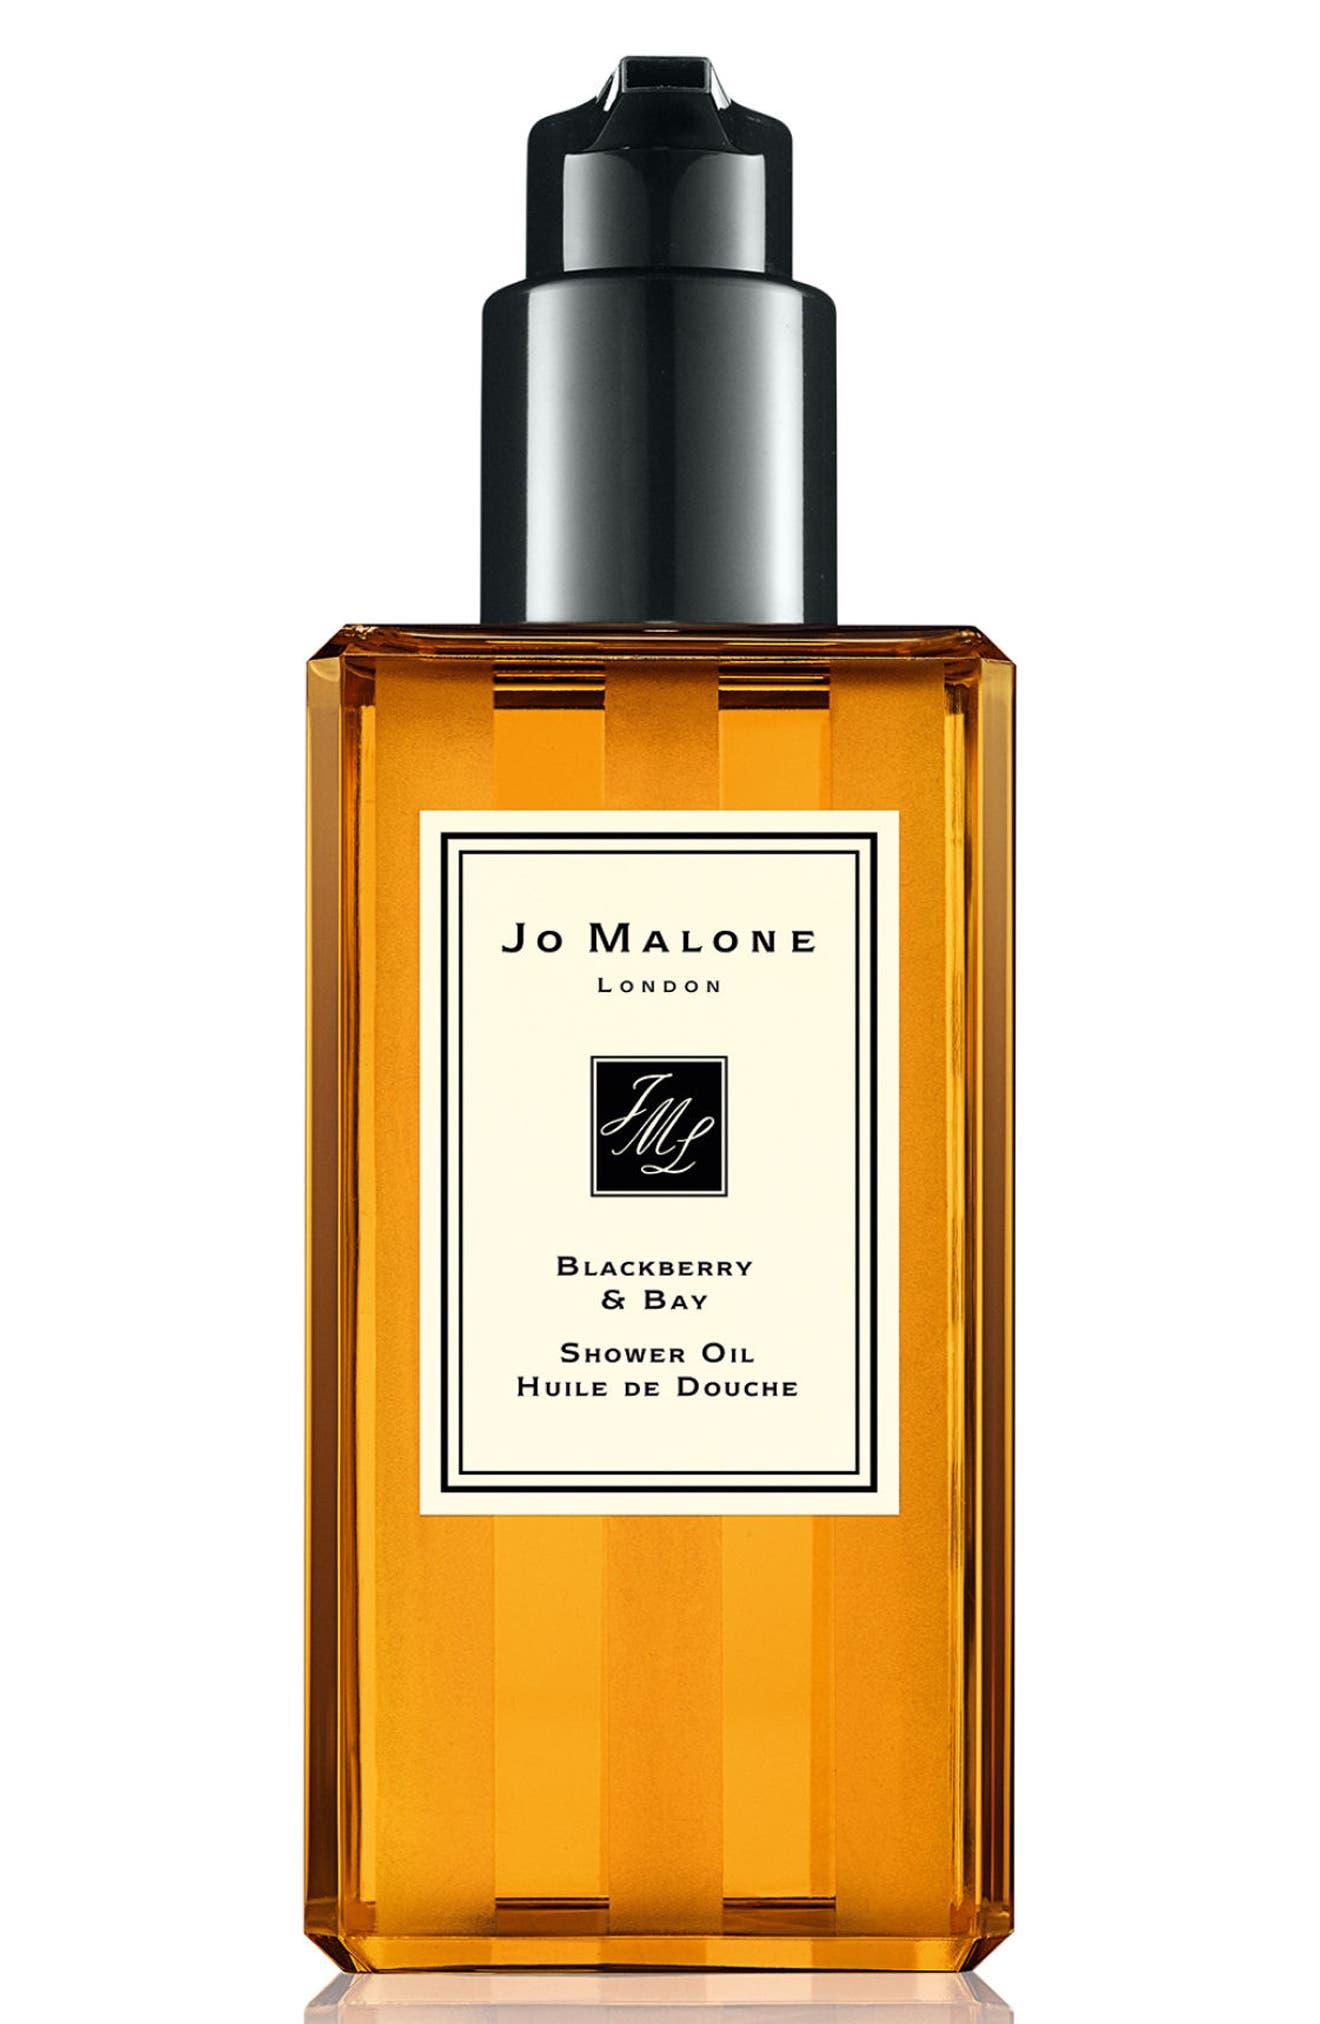 Jo Malone London™ Blackberry & Bay Bath Oil (8.5 oz.)